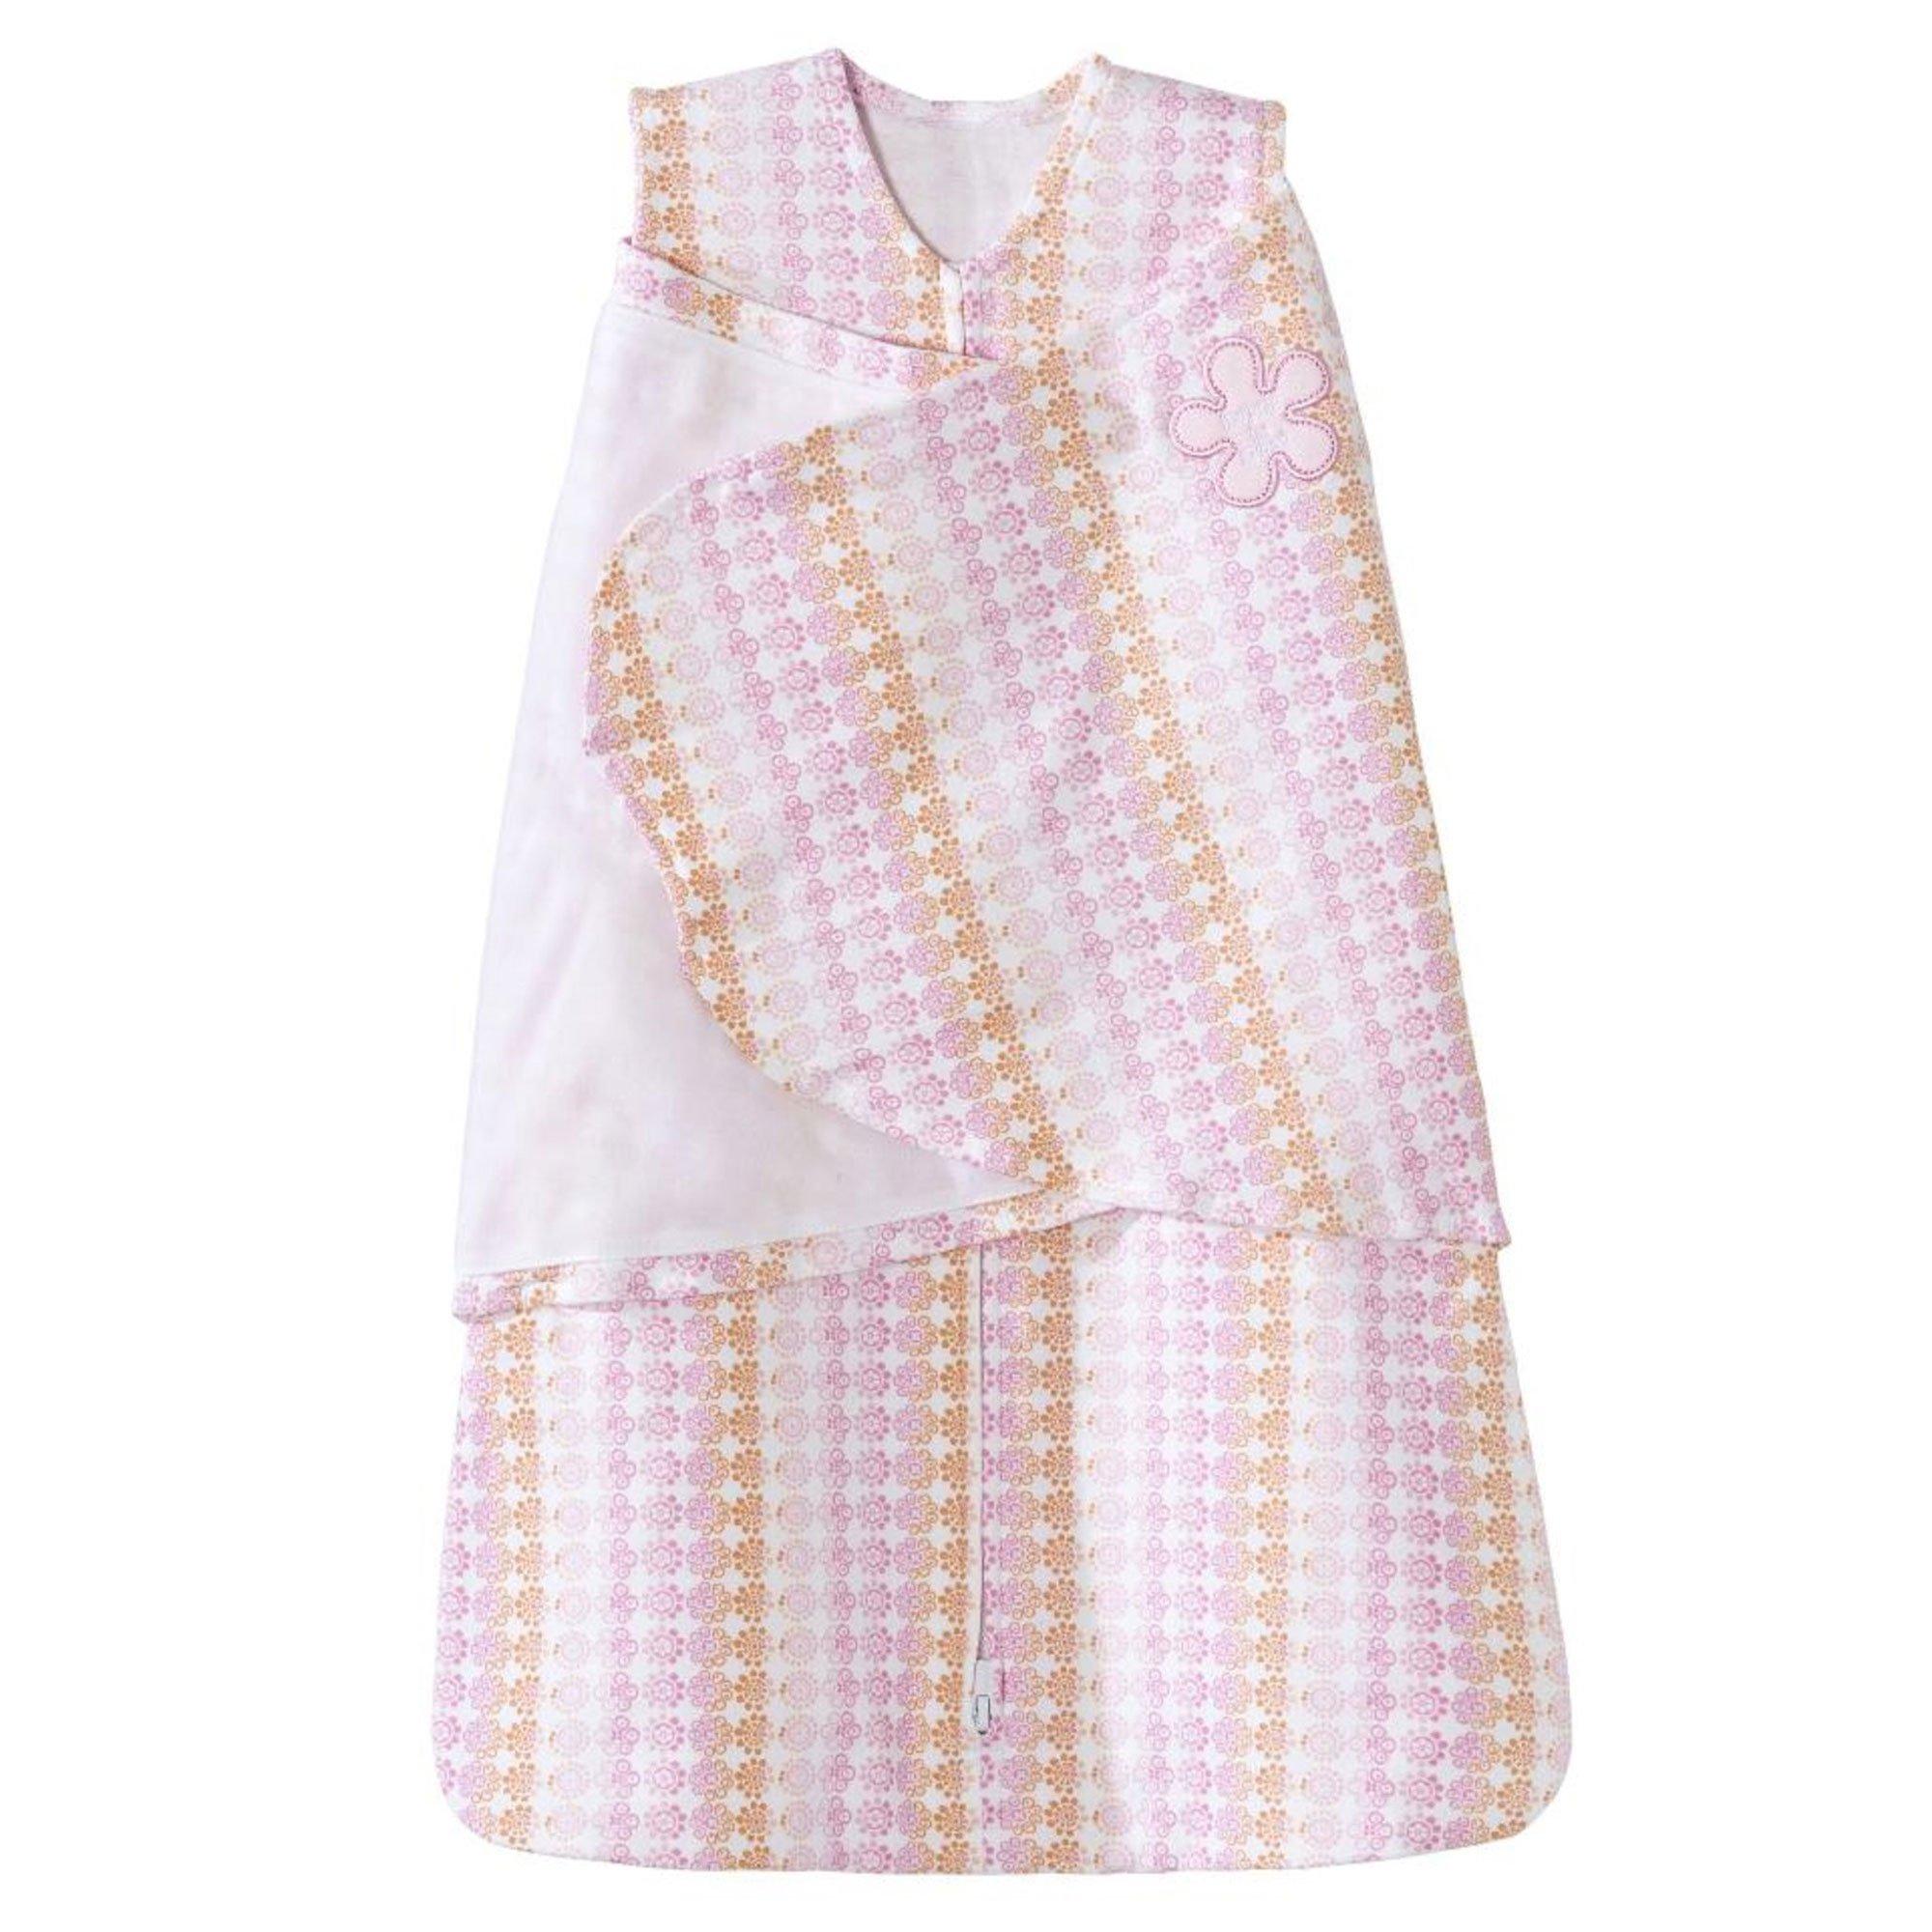 HALO SleepSack 100% Cotton Swaddle, Floral Ombre, Newborn